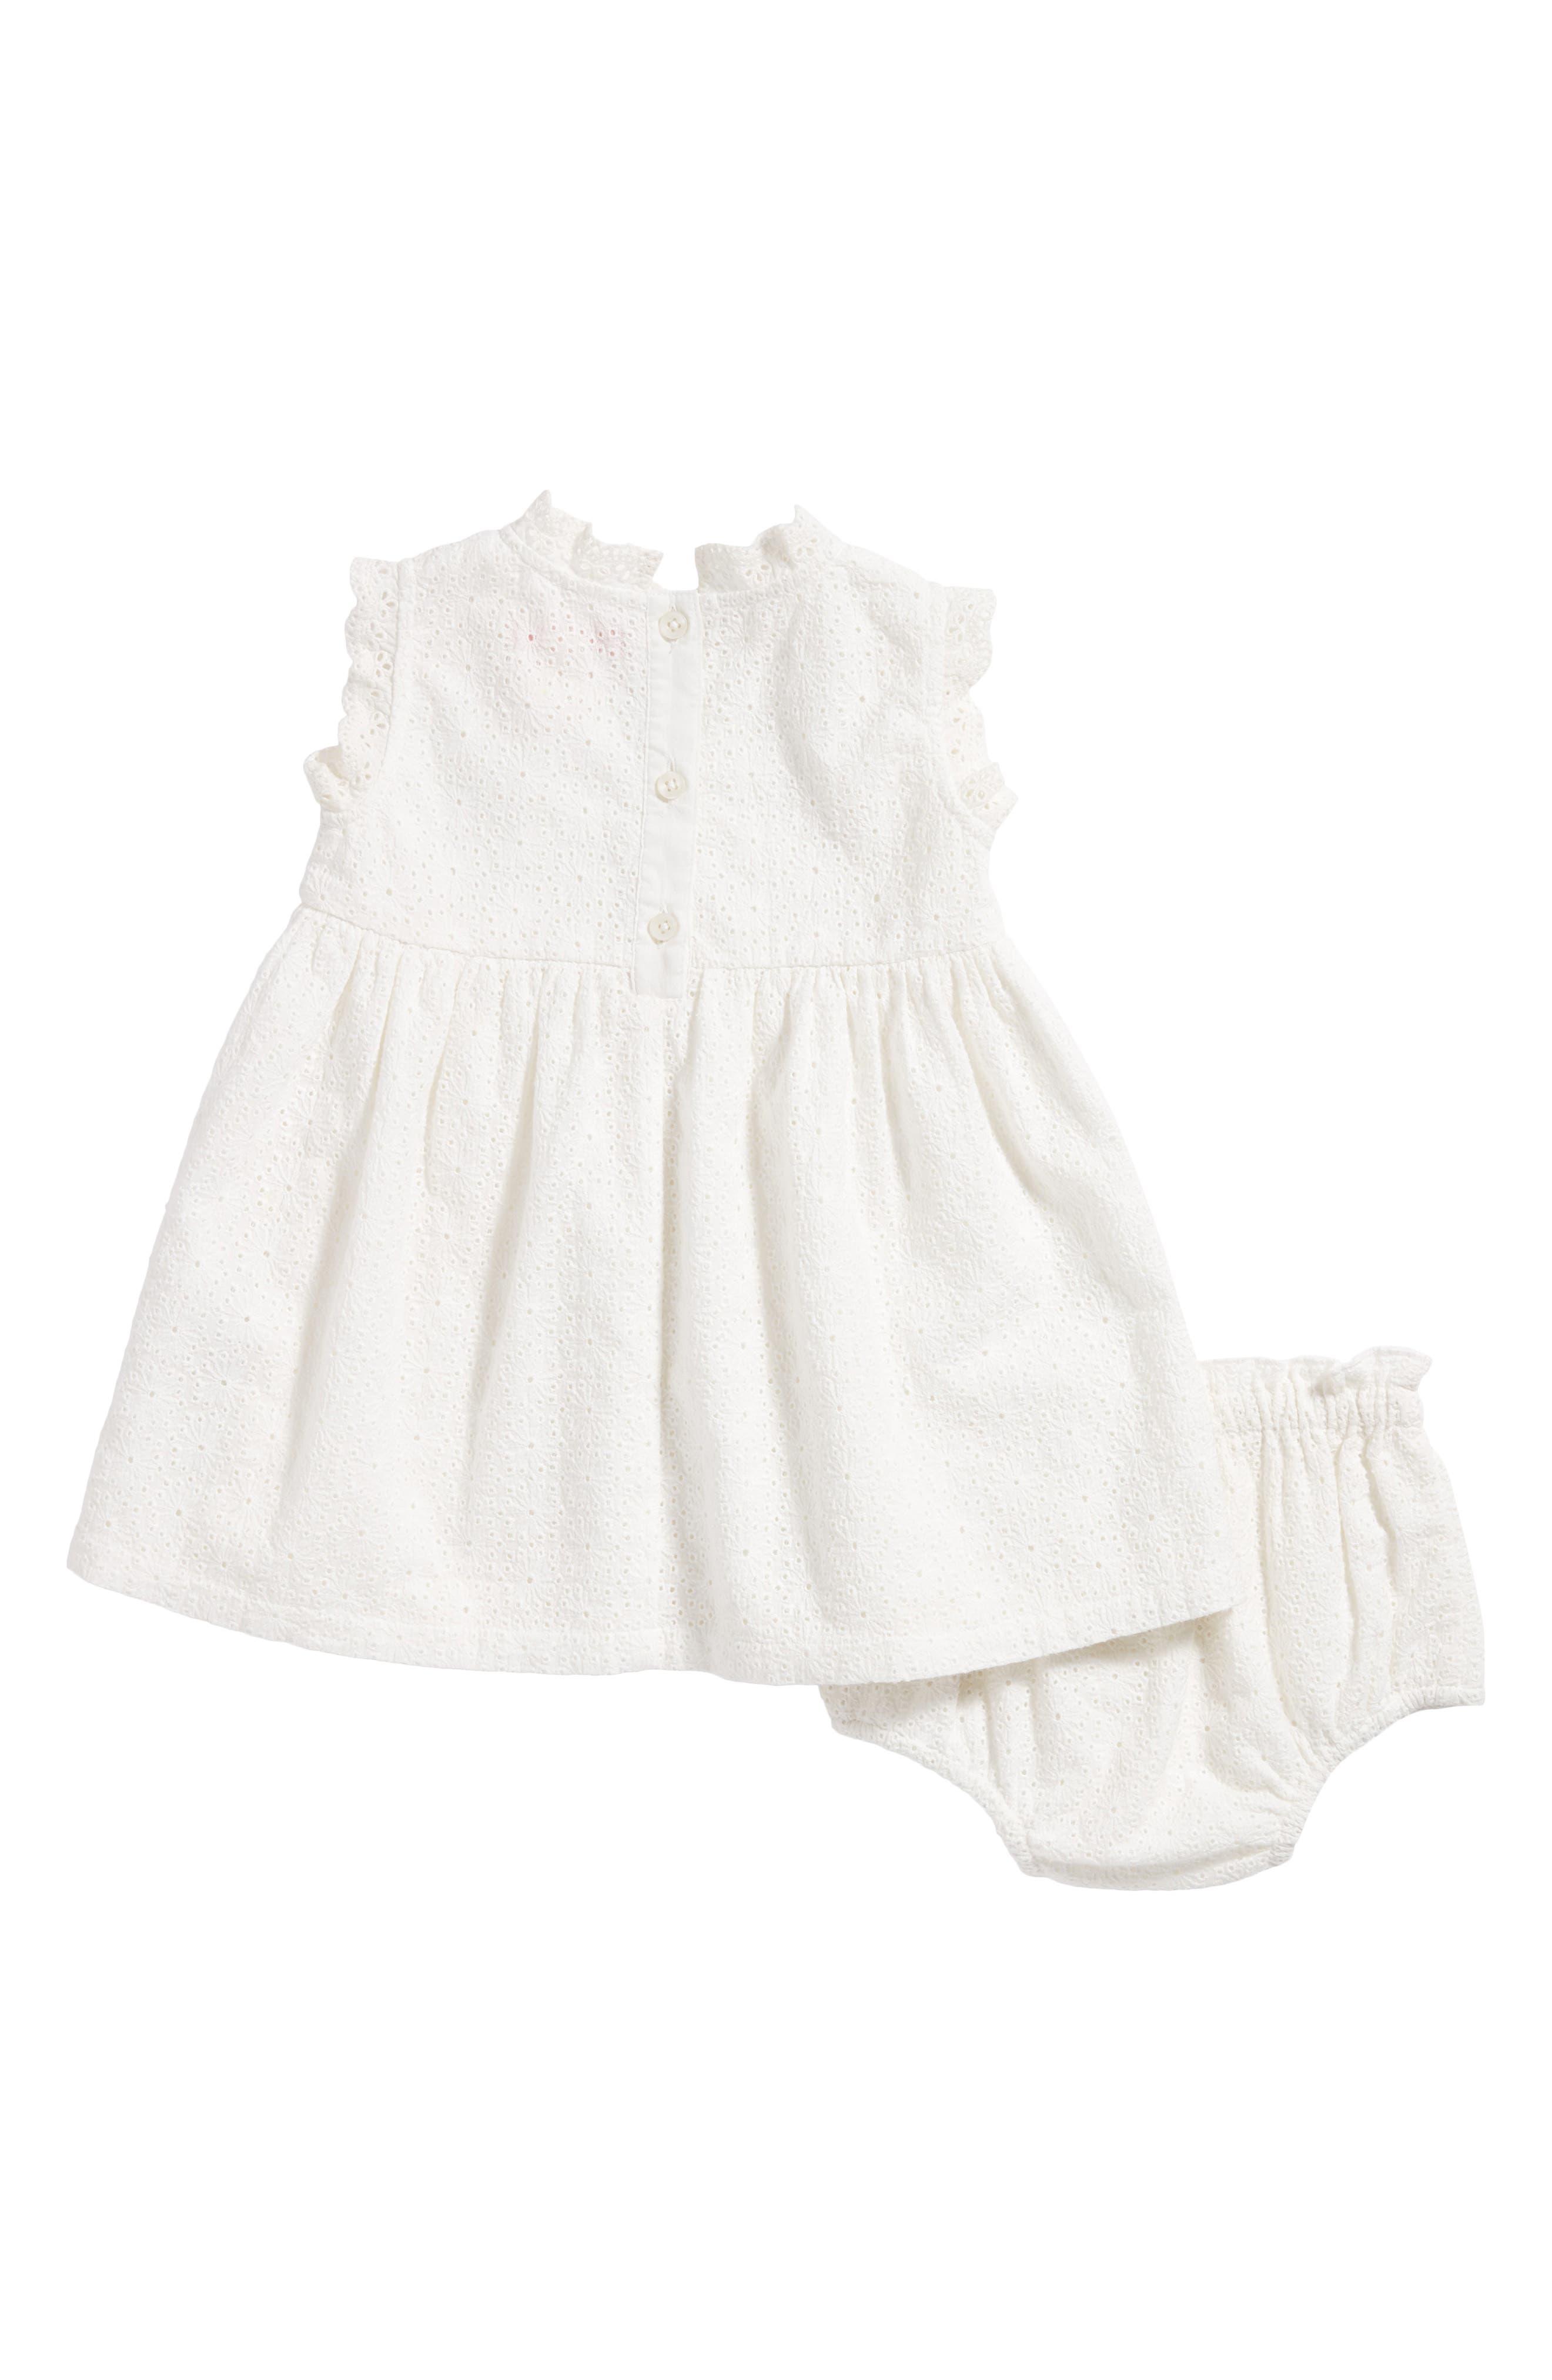 Lace Dress,                             Alternate thumbnail 2, color,                             White